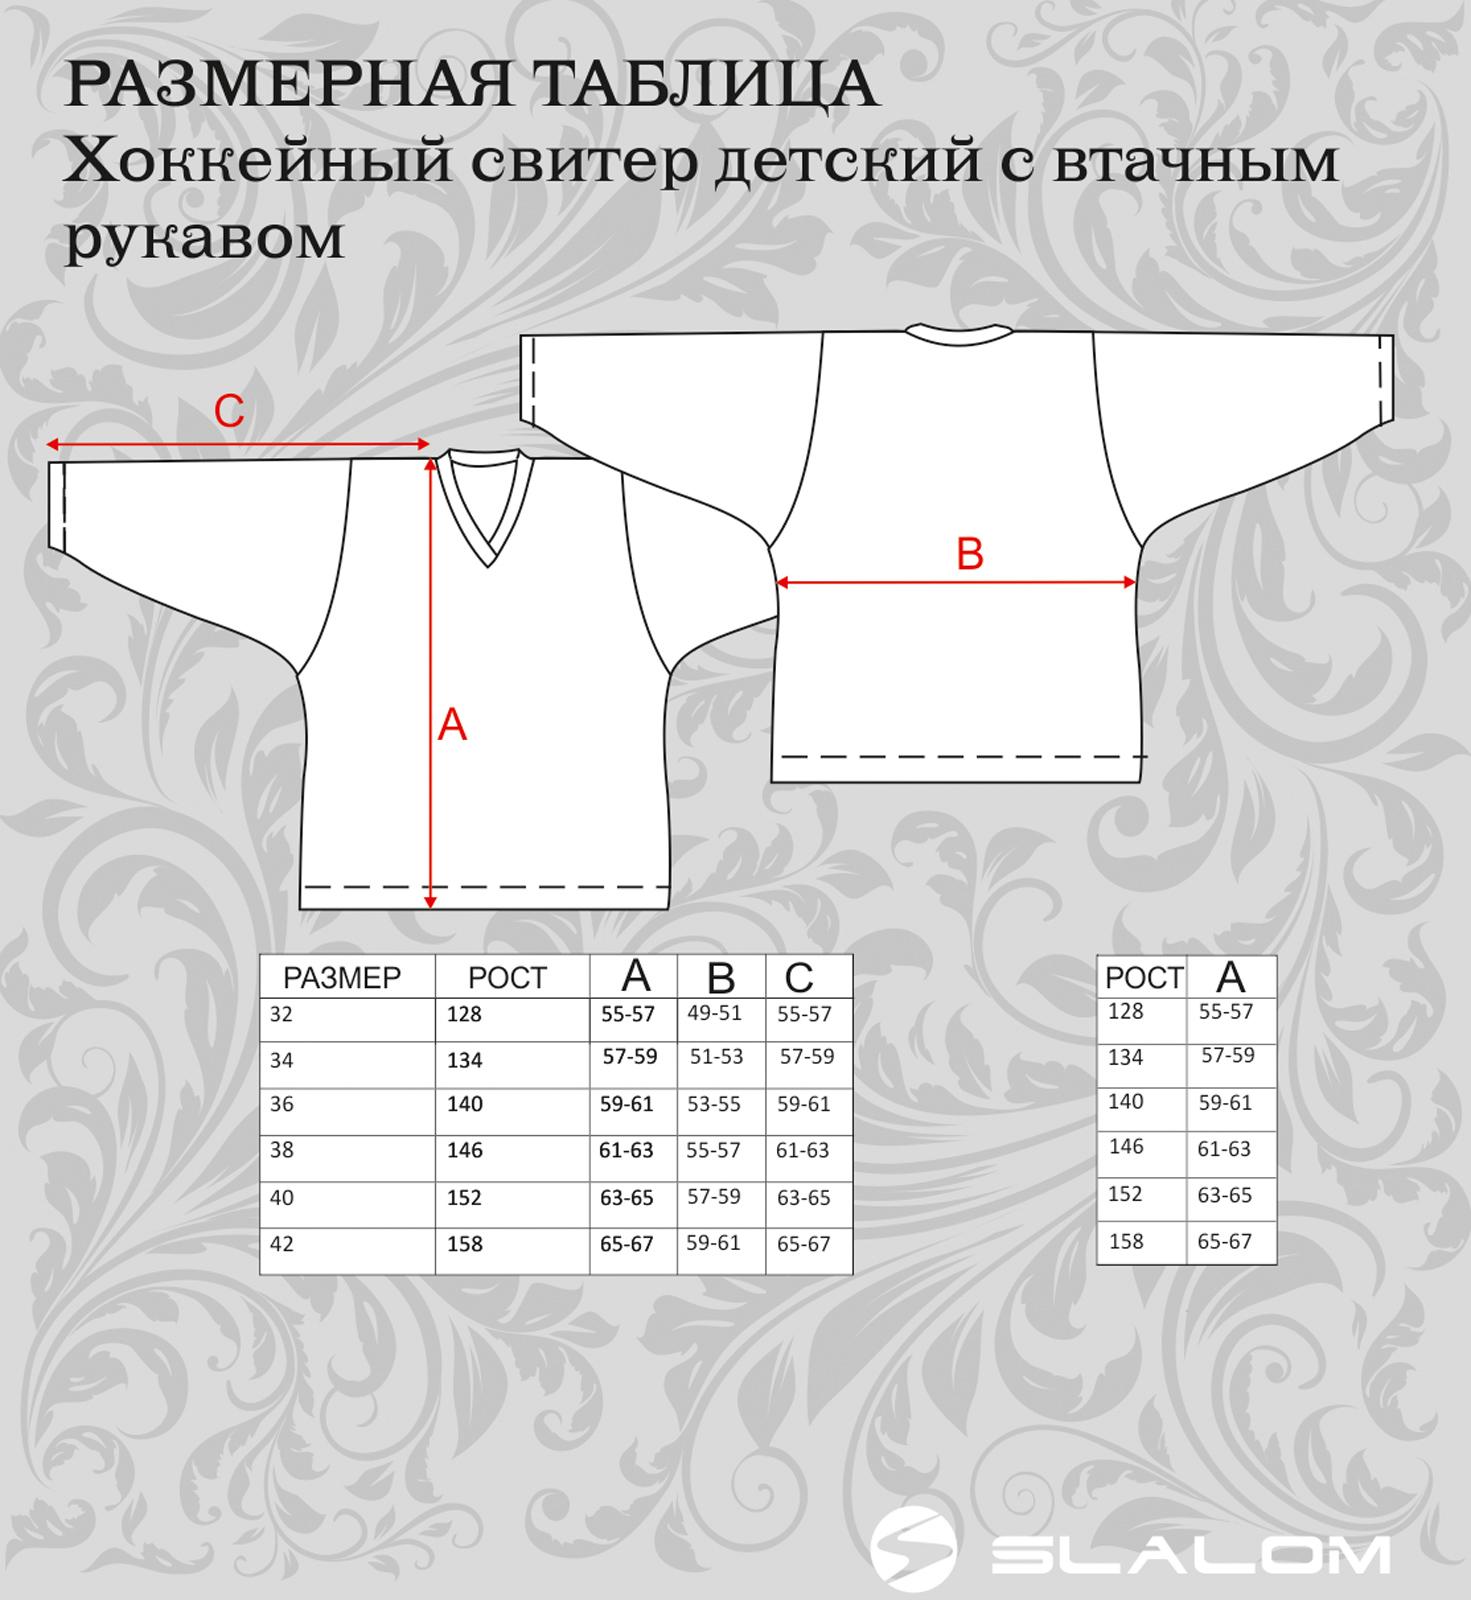 rs_hokswit_vtachnoi_detskii